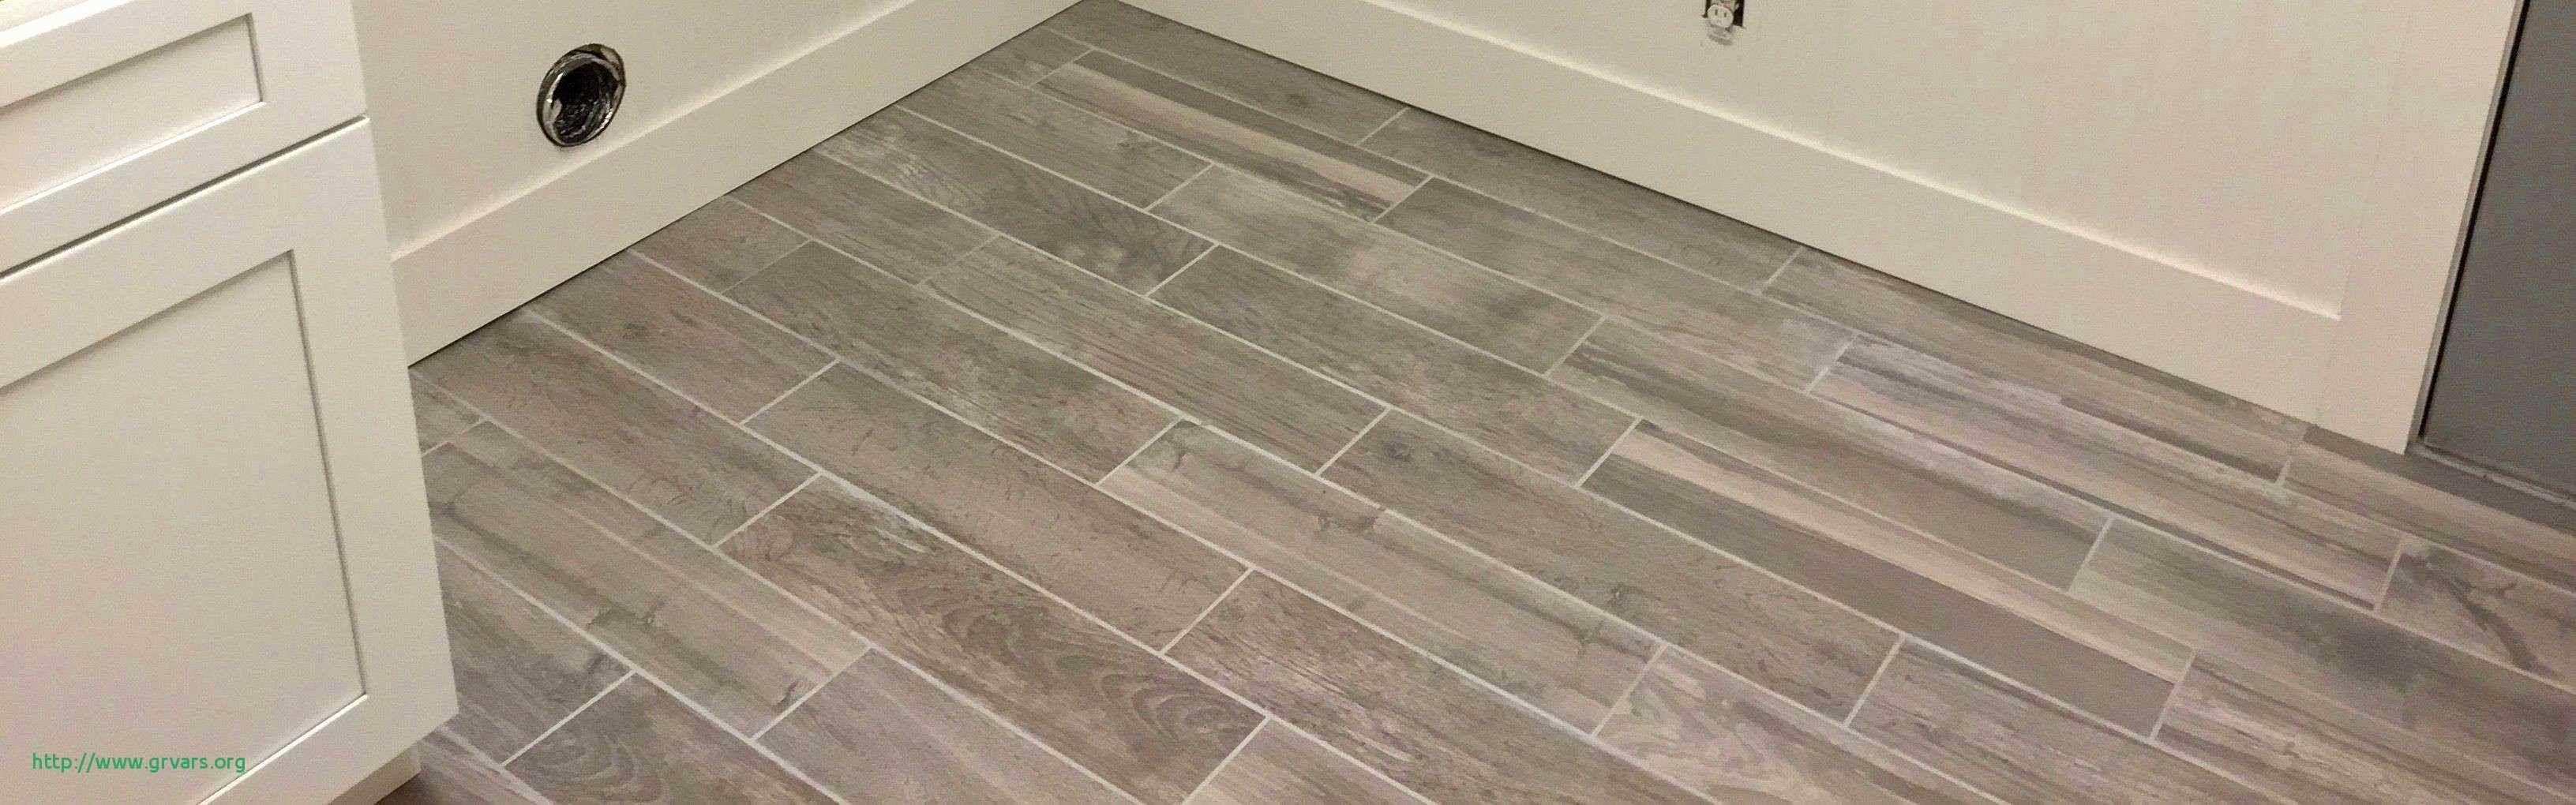 Pin Oleh Chintya Dewi Di Ceramic Floor Tiles Ideas Plank Tile